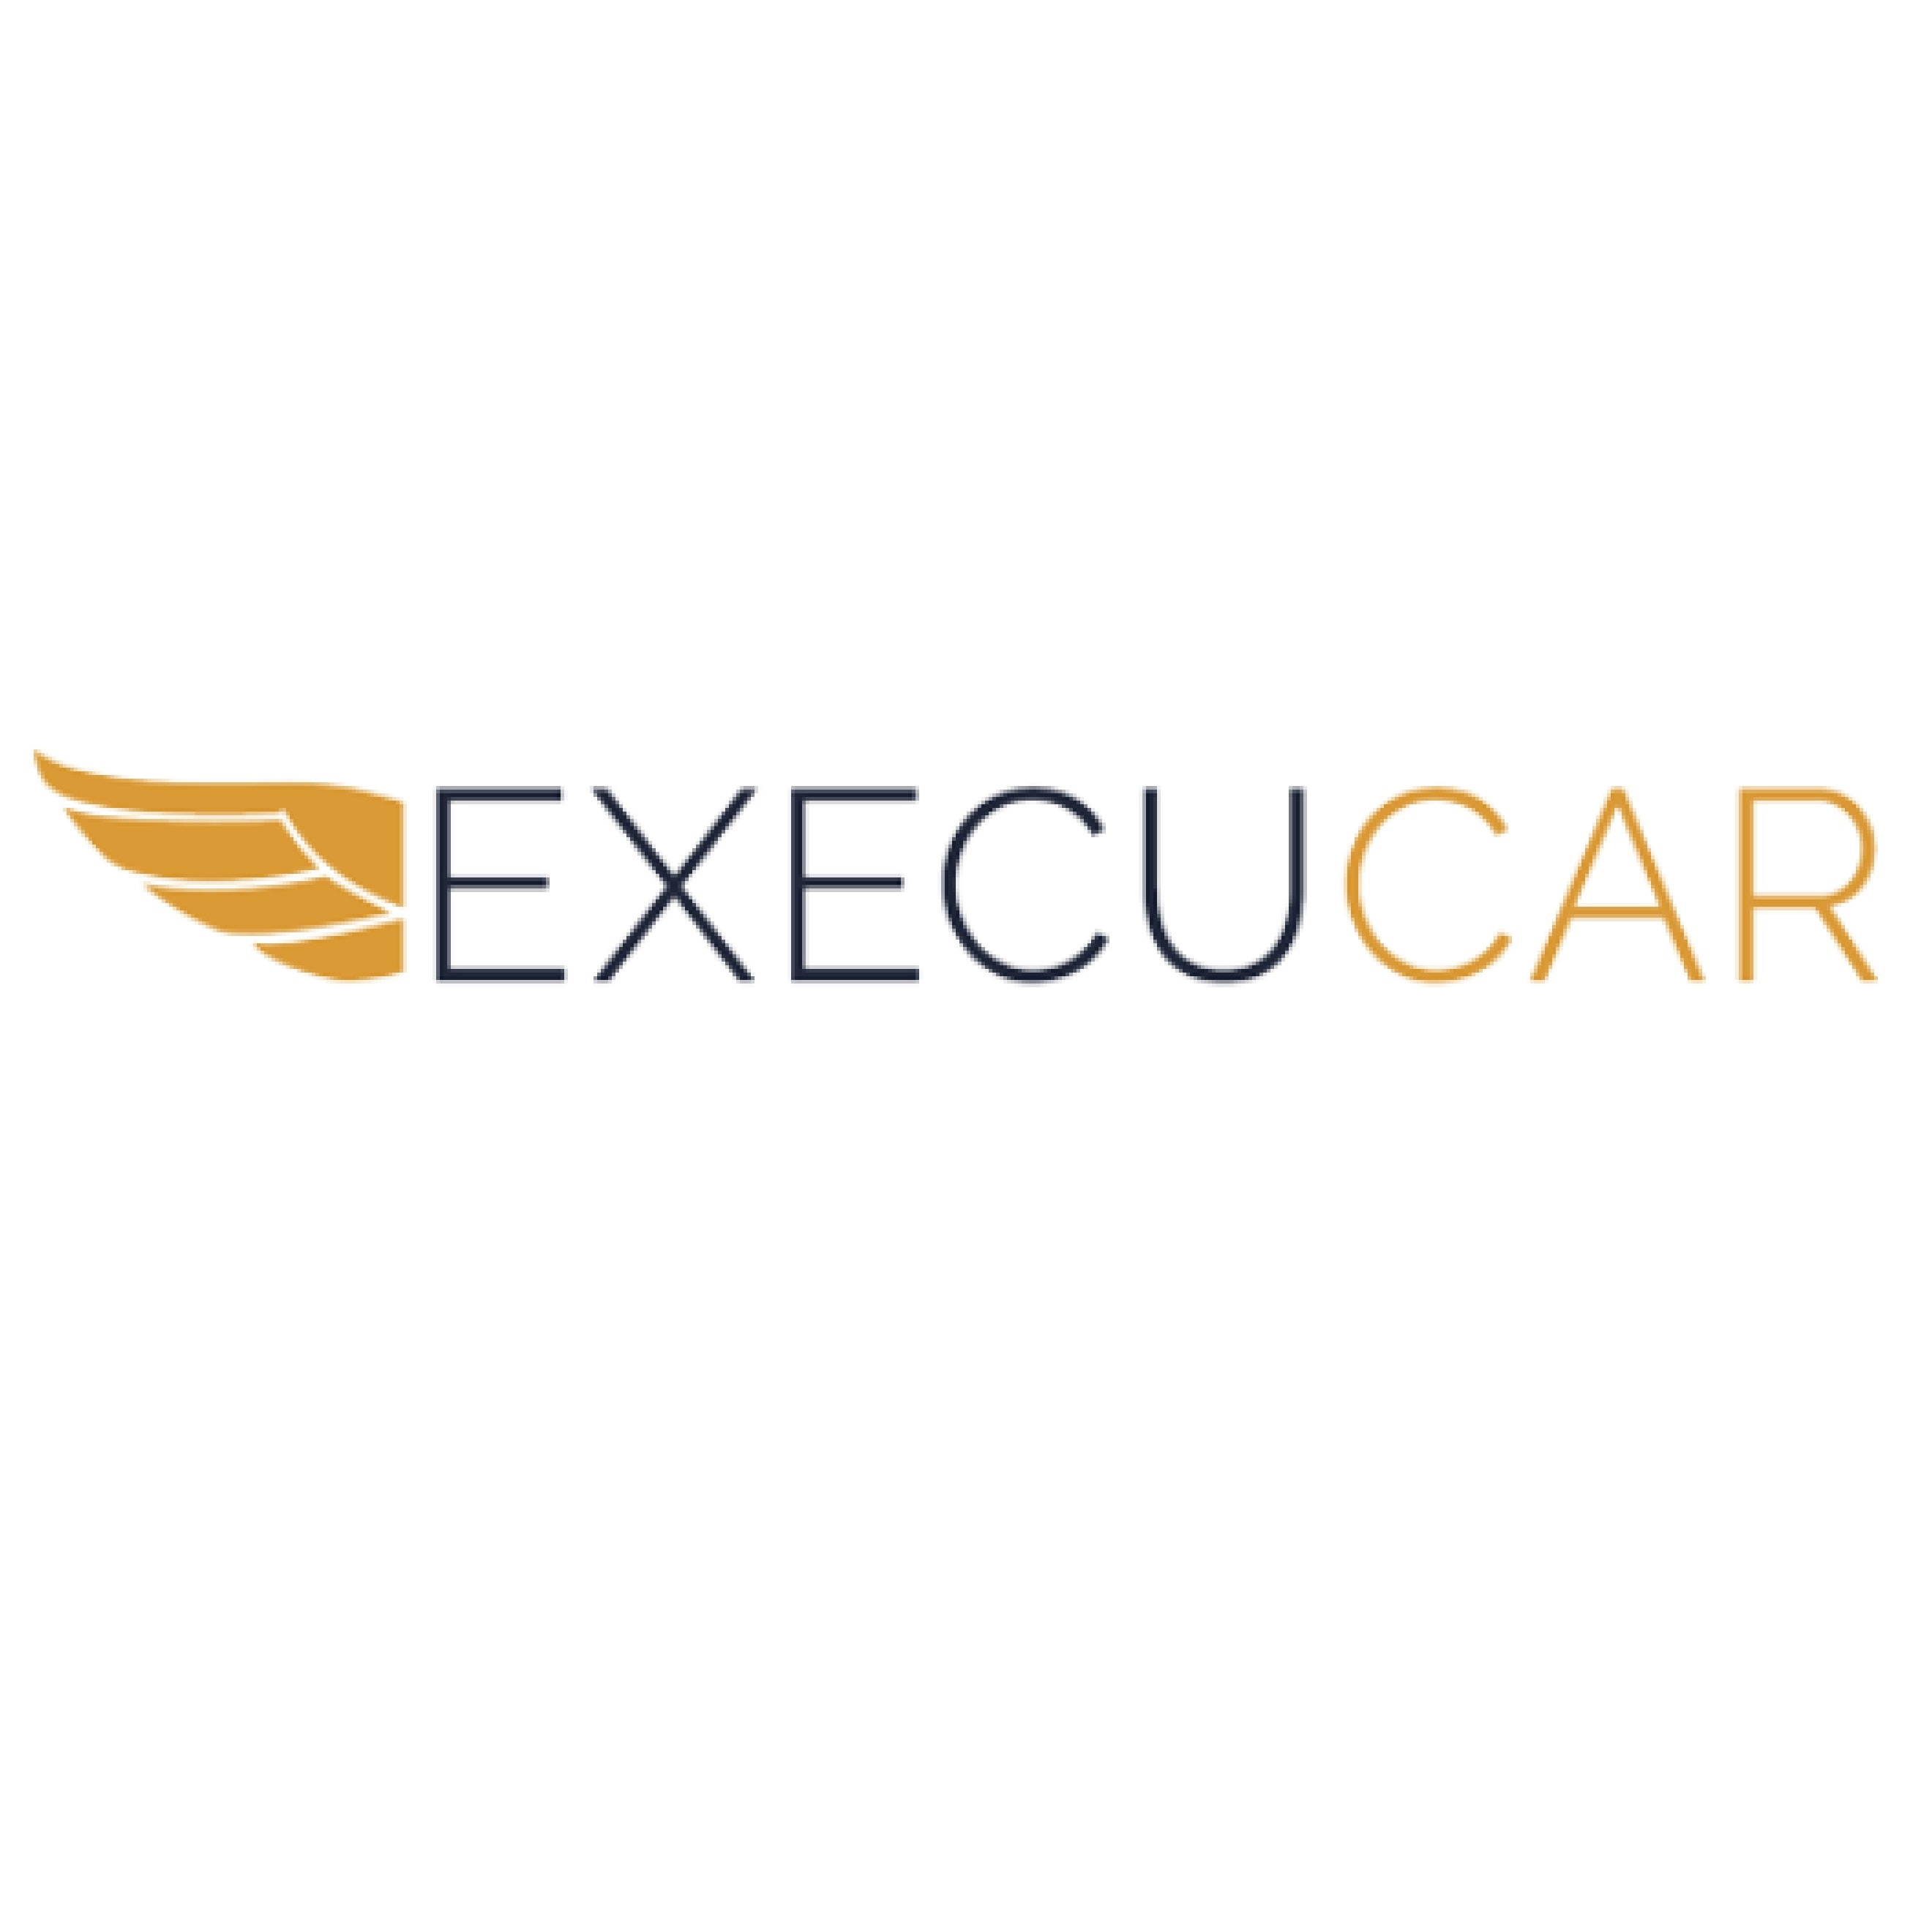 Execucar - Curbside